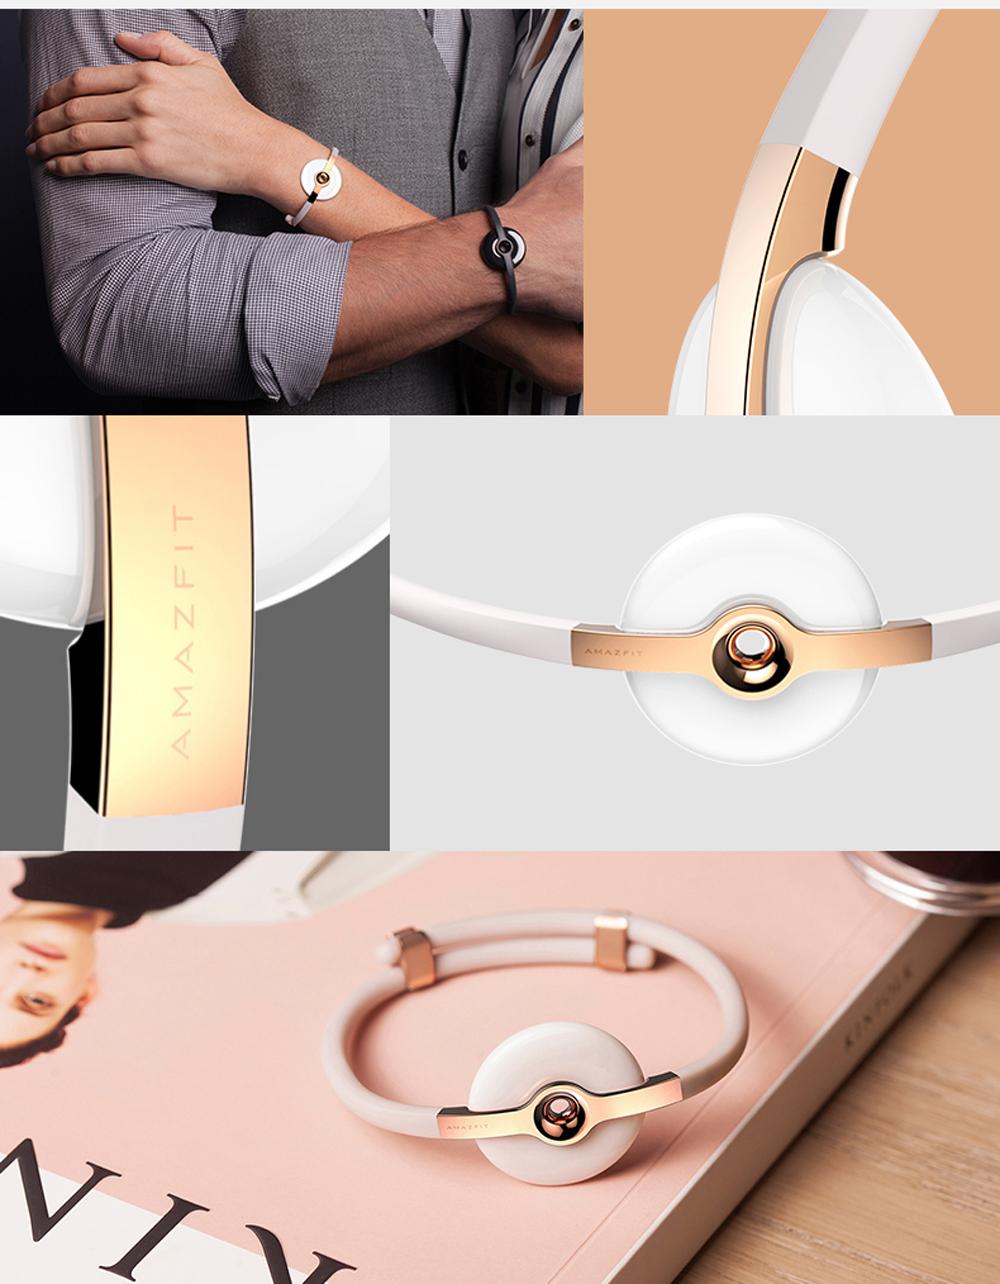 Original Xiaomi Mi Band Bracelet Amazfit Smart Wristband Fitness Sleep tracker Call Reminder with Wireless Charging 10